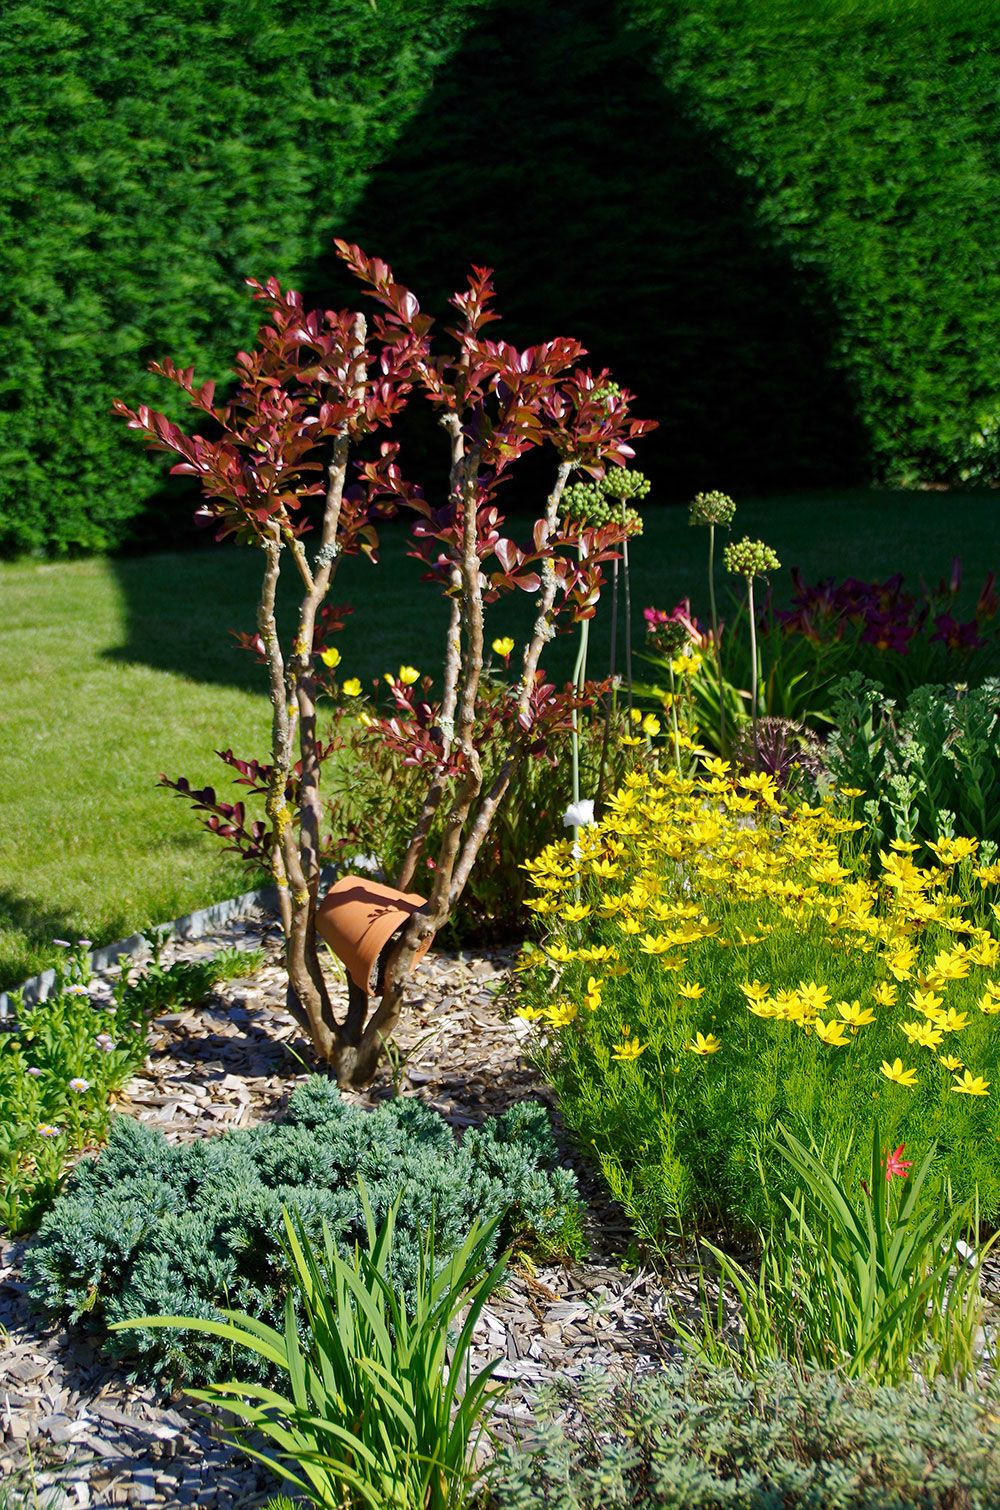 Aménagement végétal : bosquet végétal